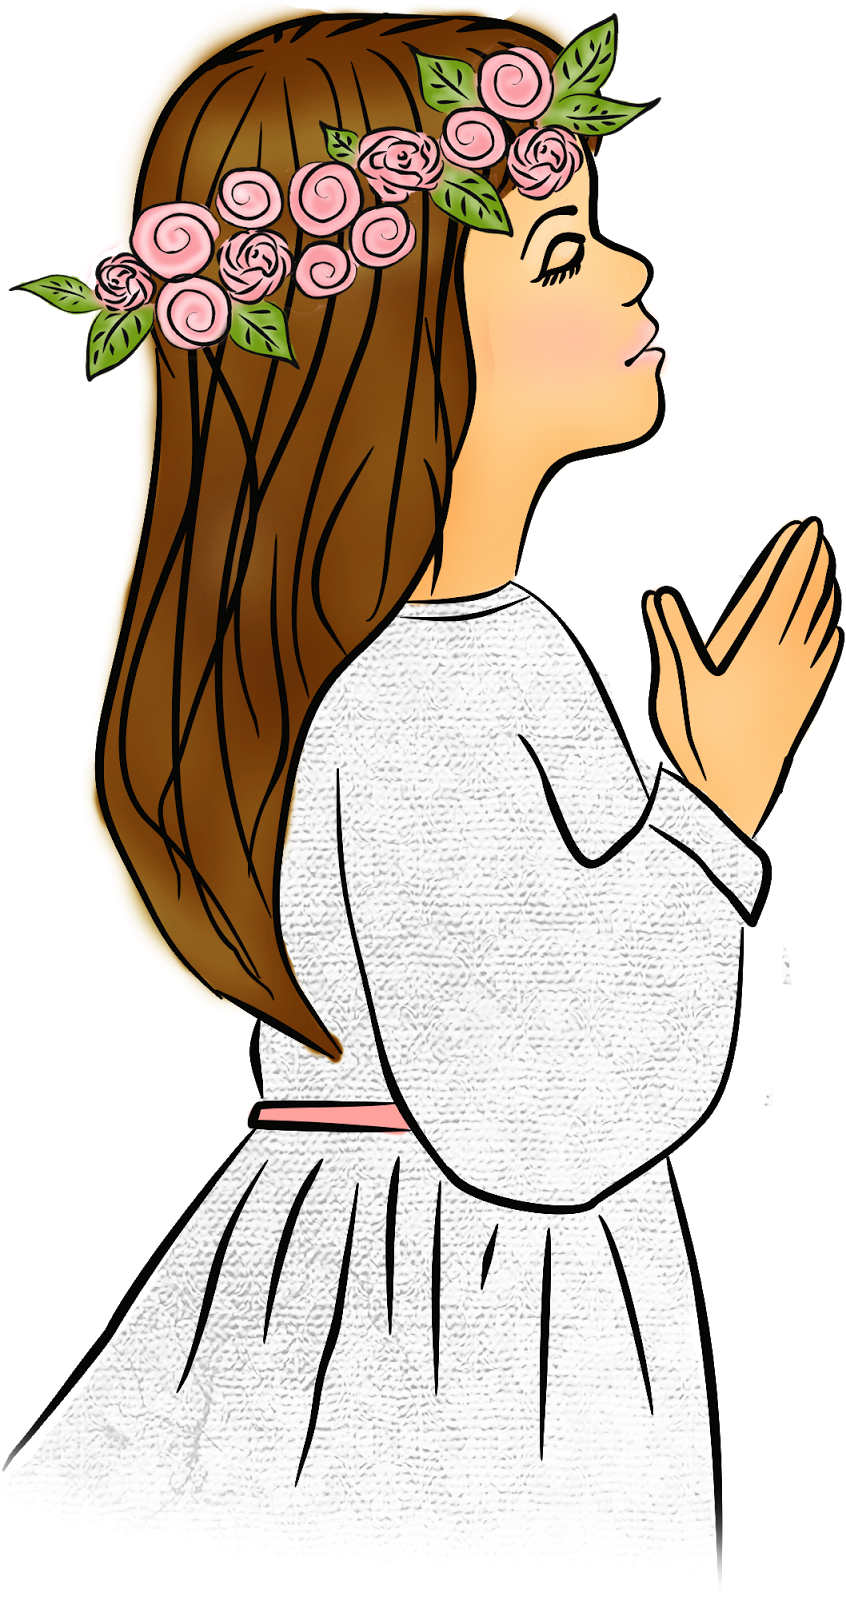 Digi stemple by alicecreations. Communion clipart remember me